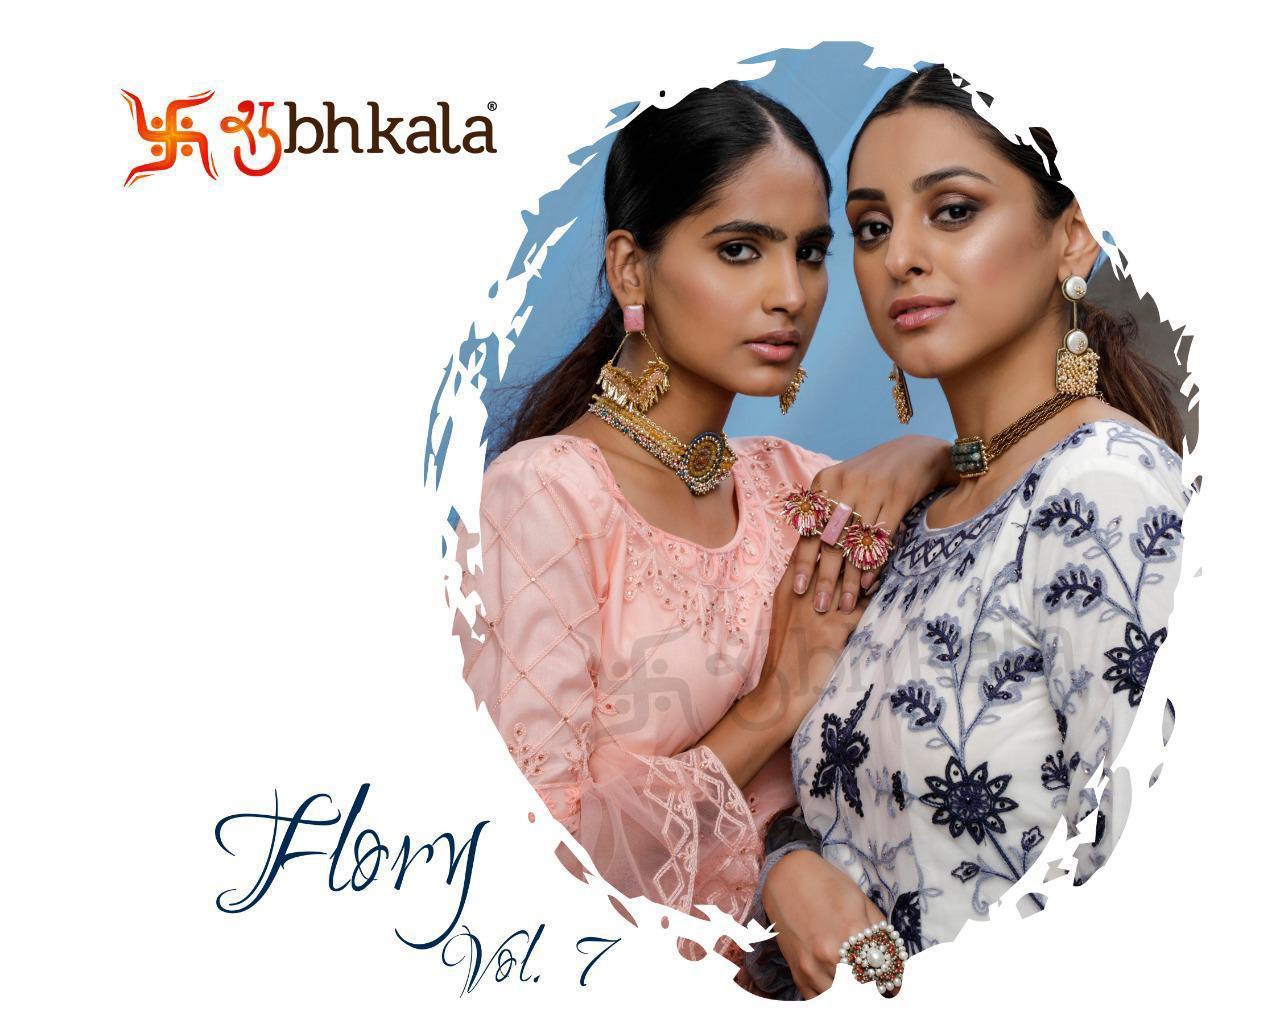 Shubhkala Flory Vol 7 Exclusive Designer Net Party Wear Anarkali Suit Supplier